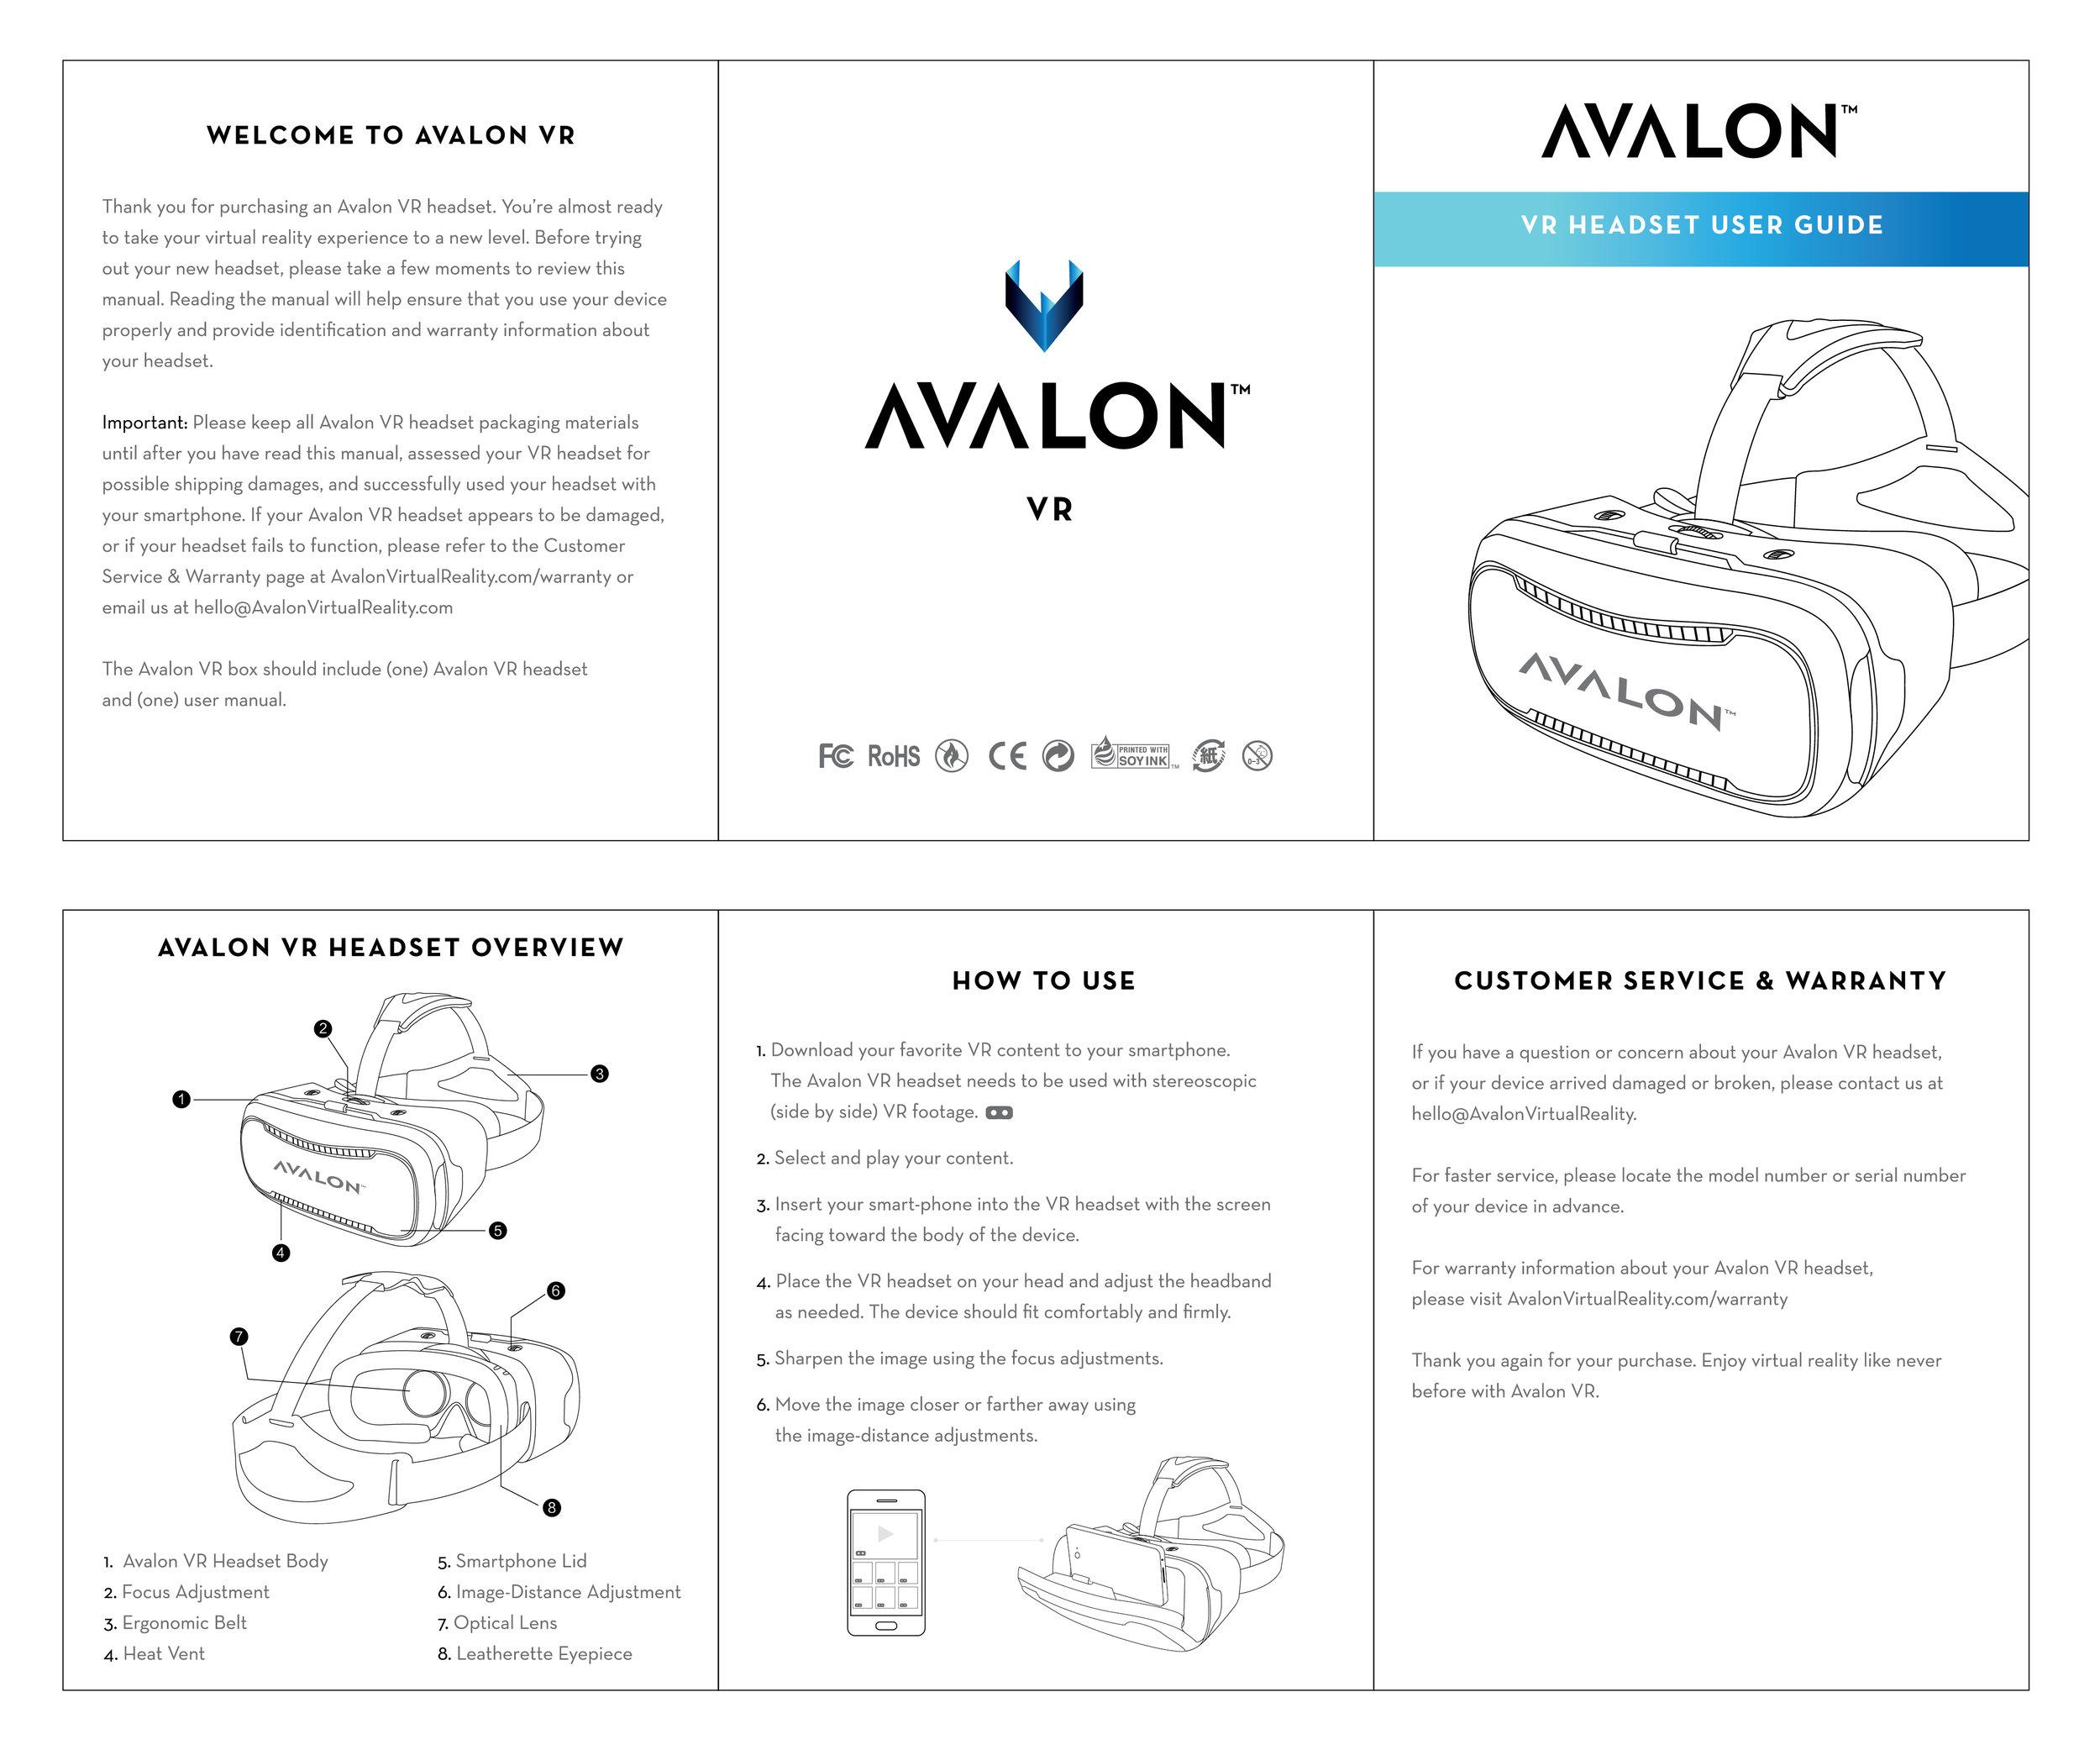 AvalonVR_UserGuide_Revised6Page_FLAT_Rv110916-01.jpg